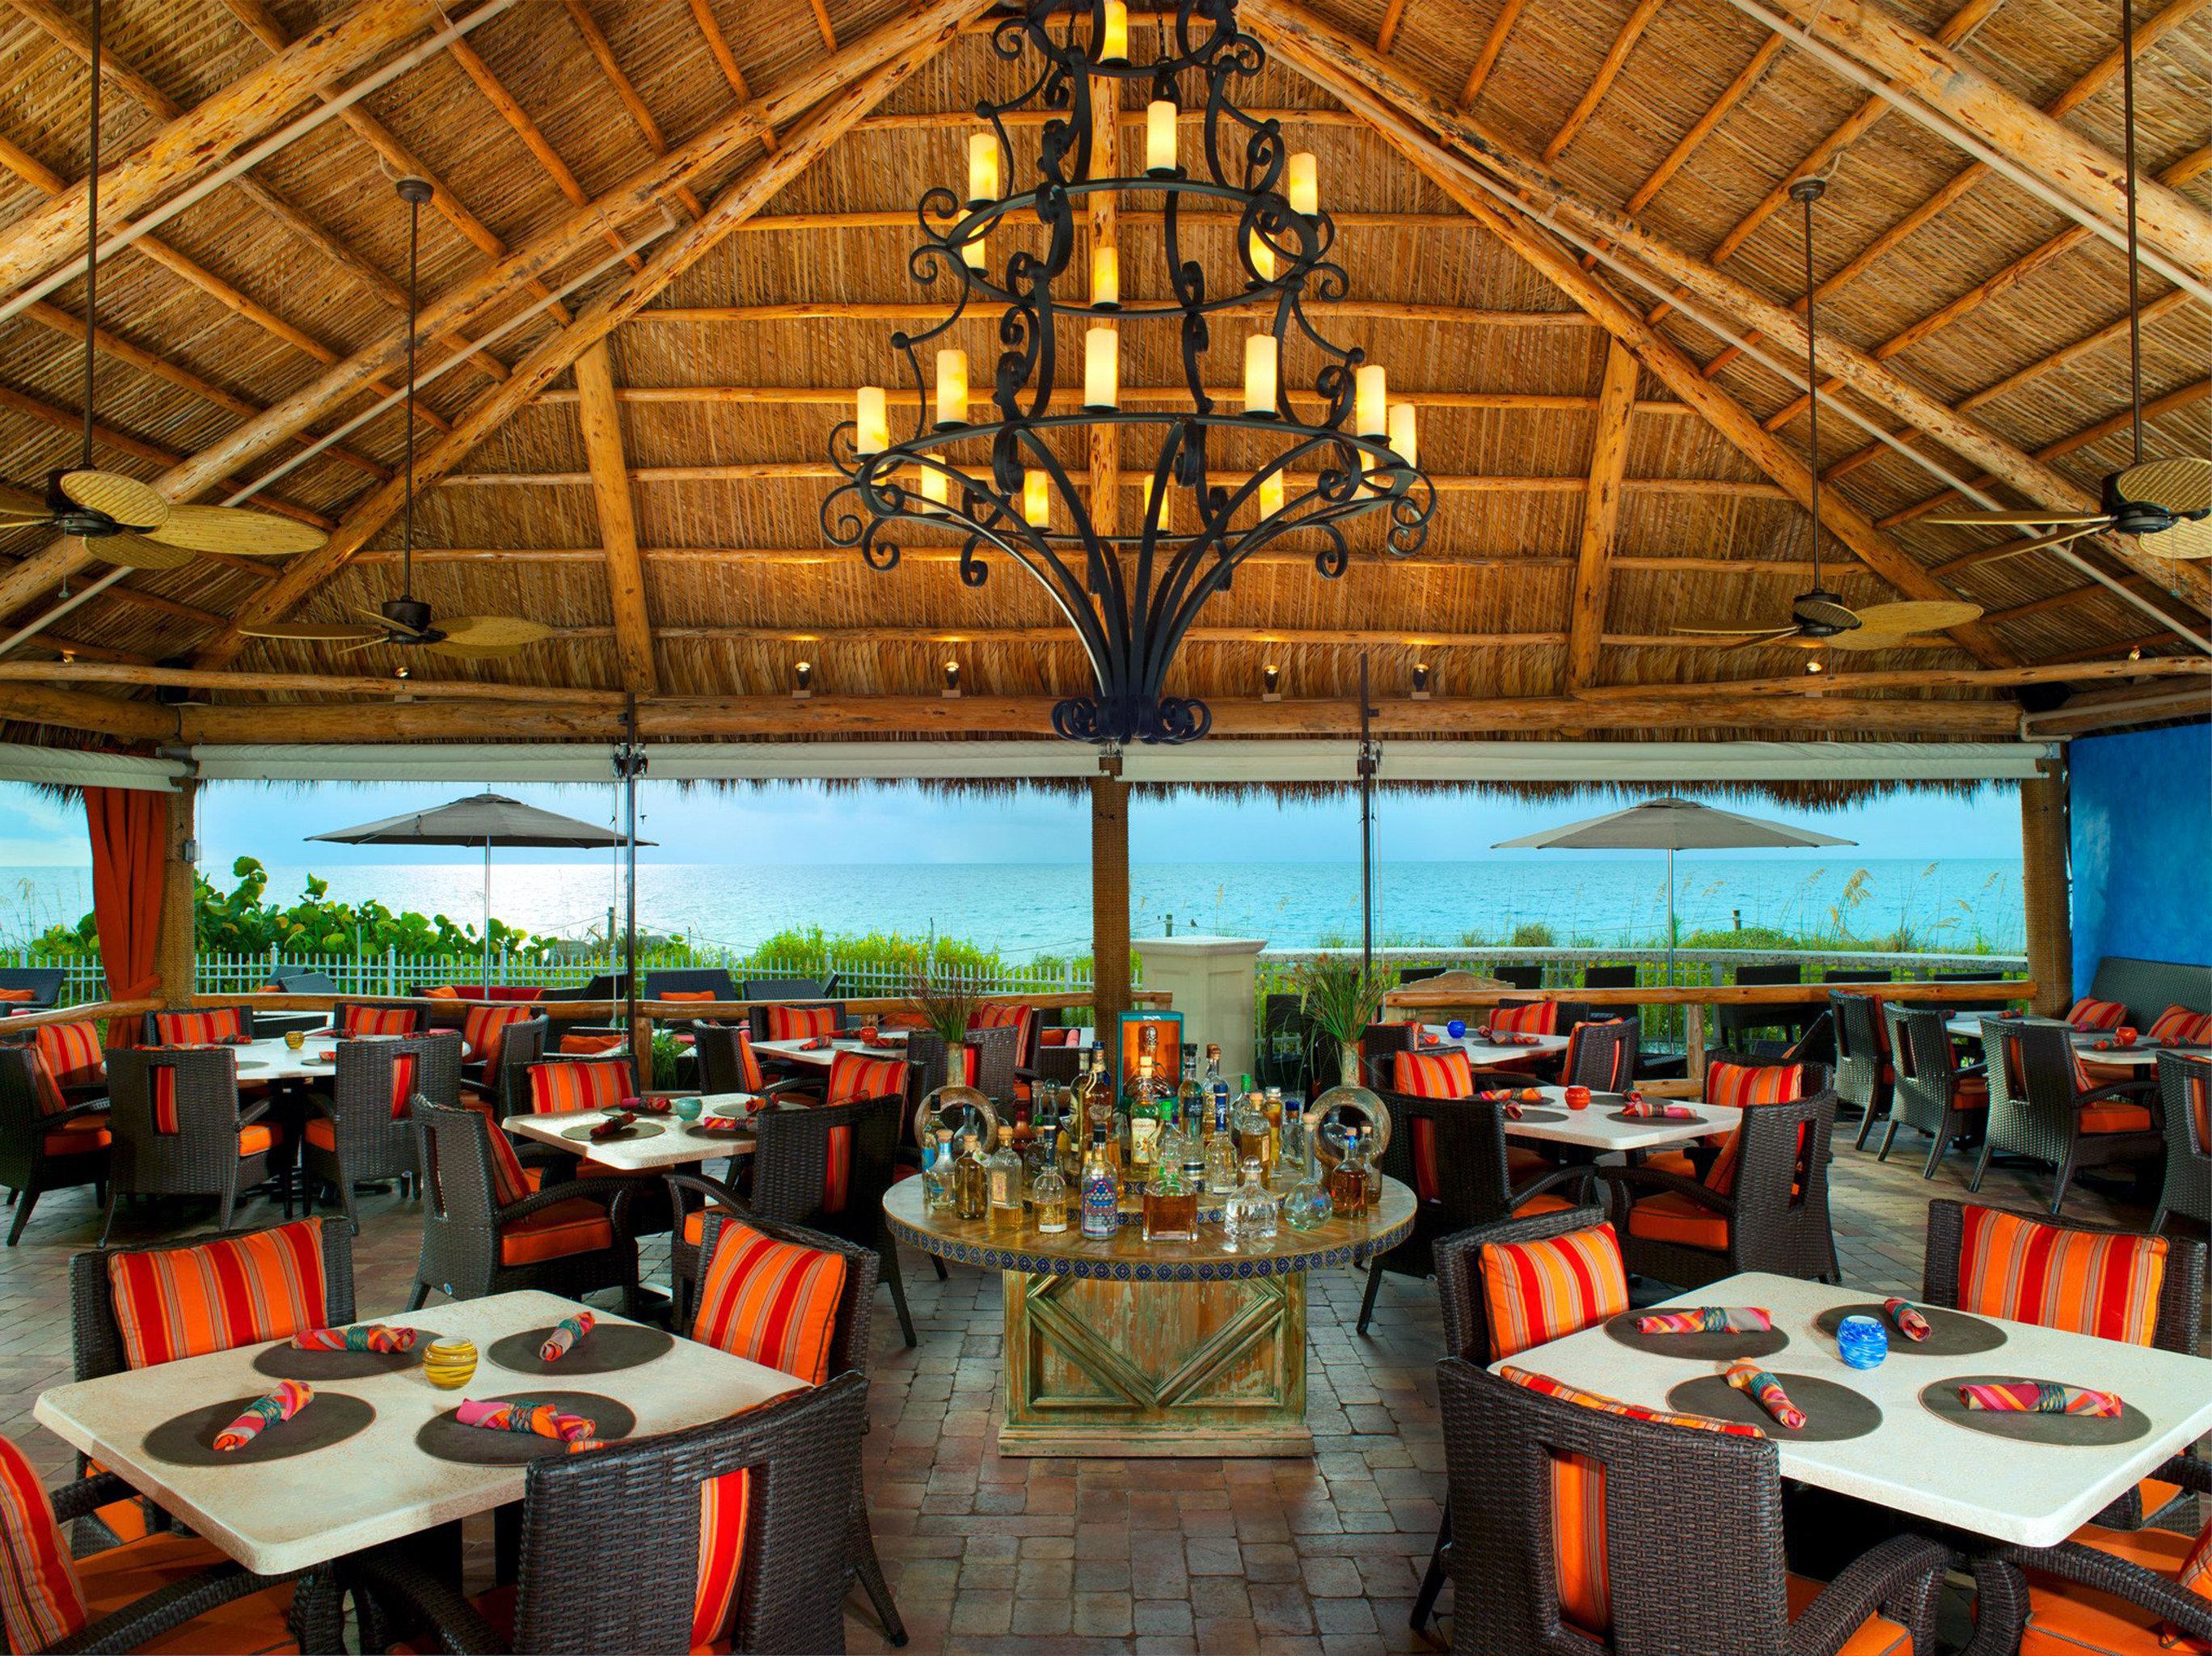 Bar Dining Drink Eat Elegant Luxury Scenic views Tropical restaurant Resort tavern